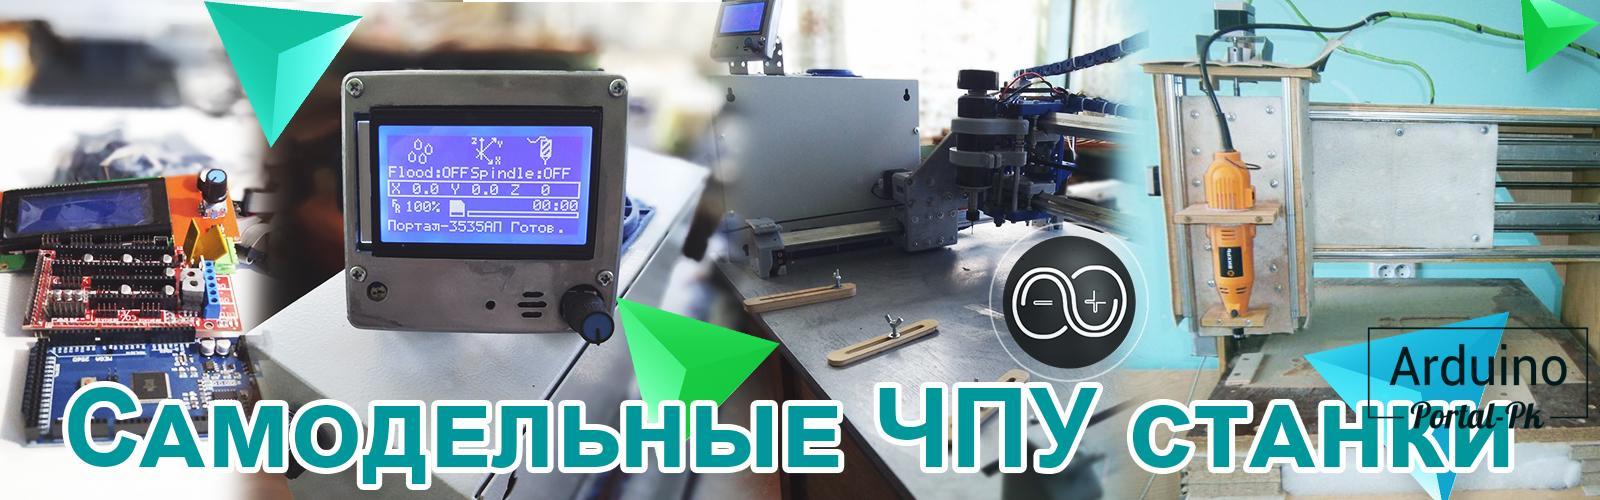 Разработка ЧПУ станков на Arduino.